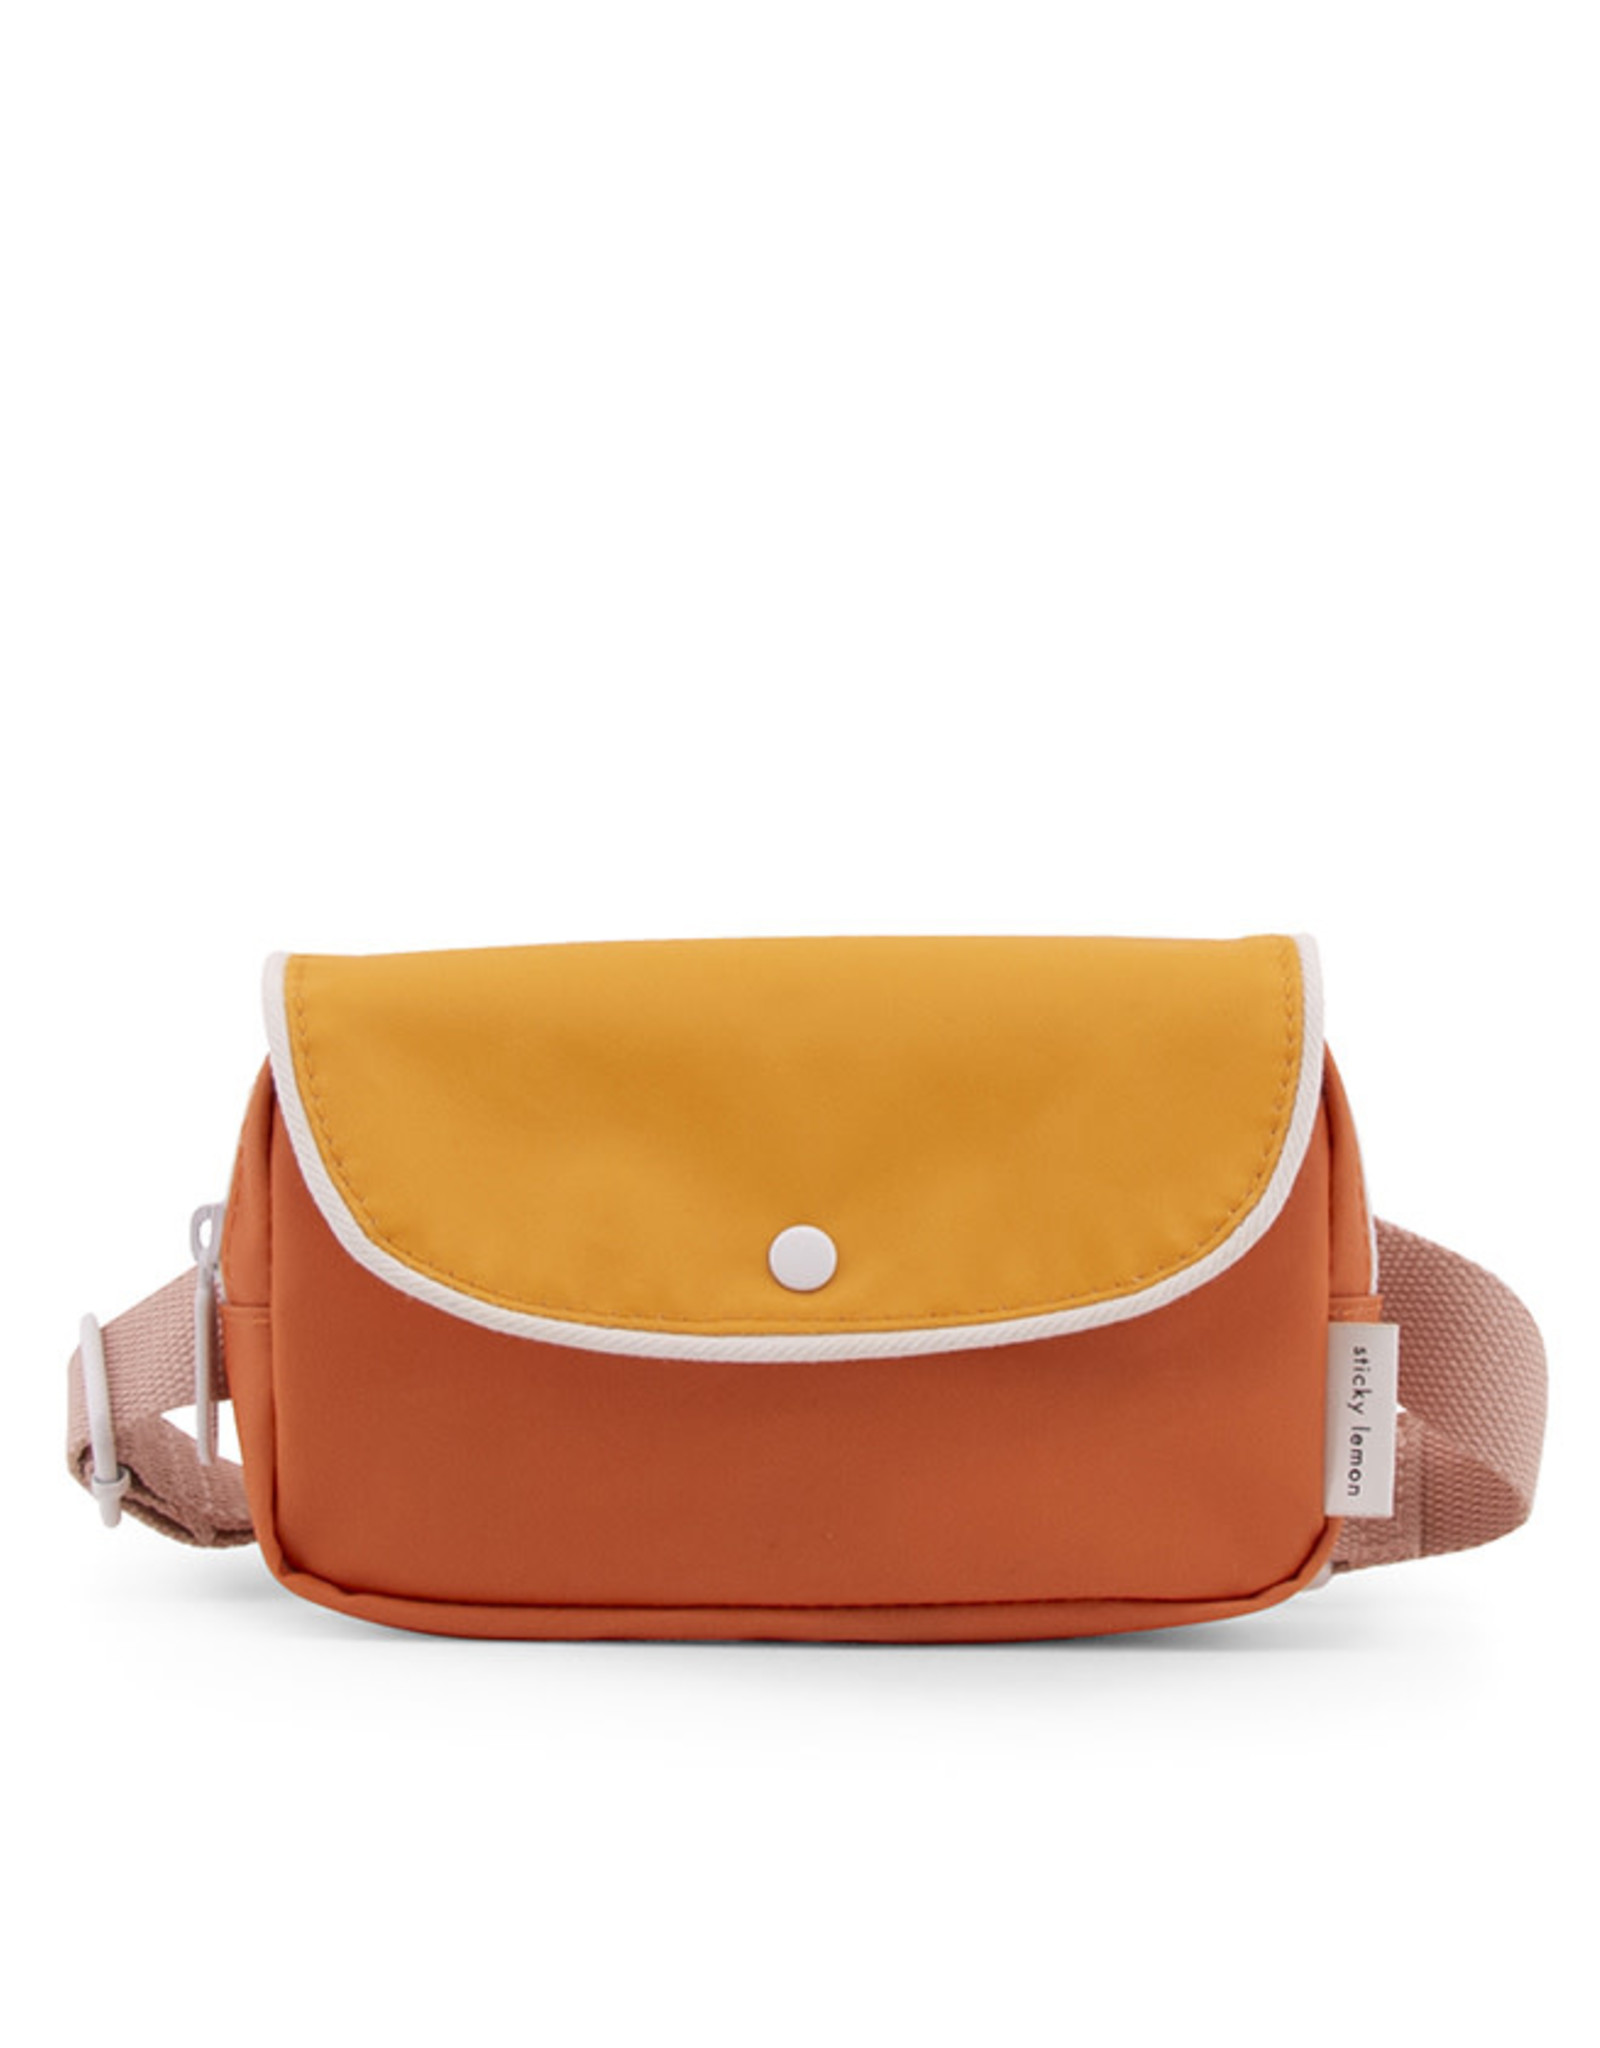 Sticky Lemon Fanny Pack Wanderer-carrot orange/sunny yellow/candy pink